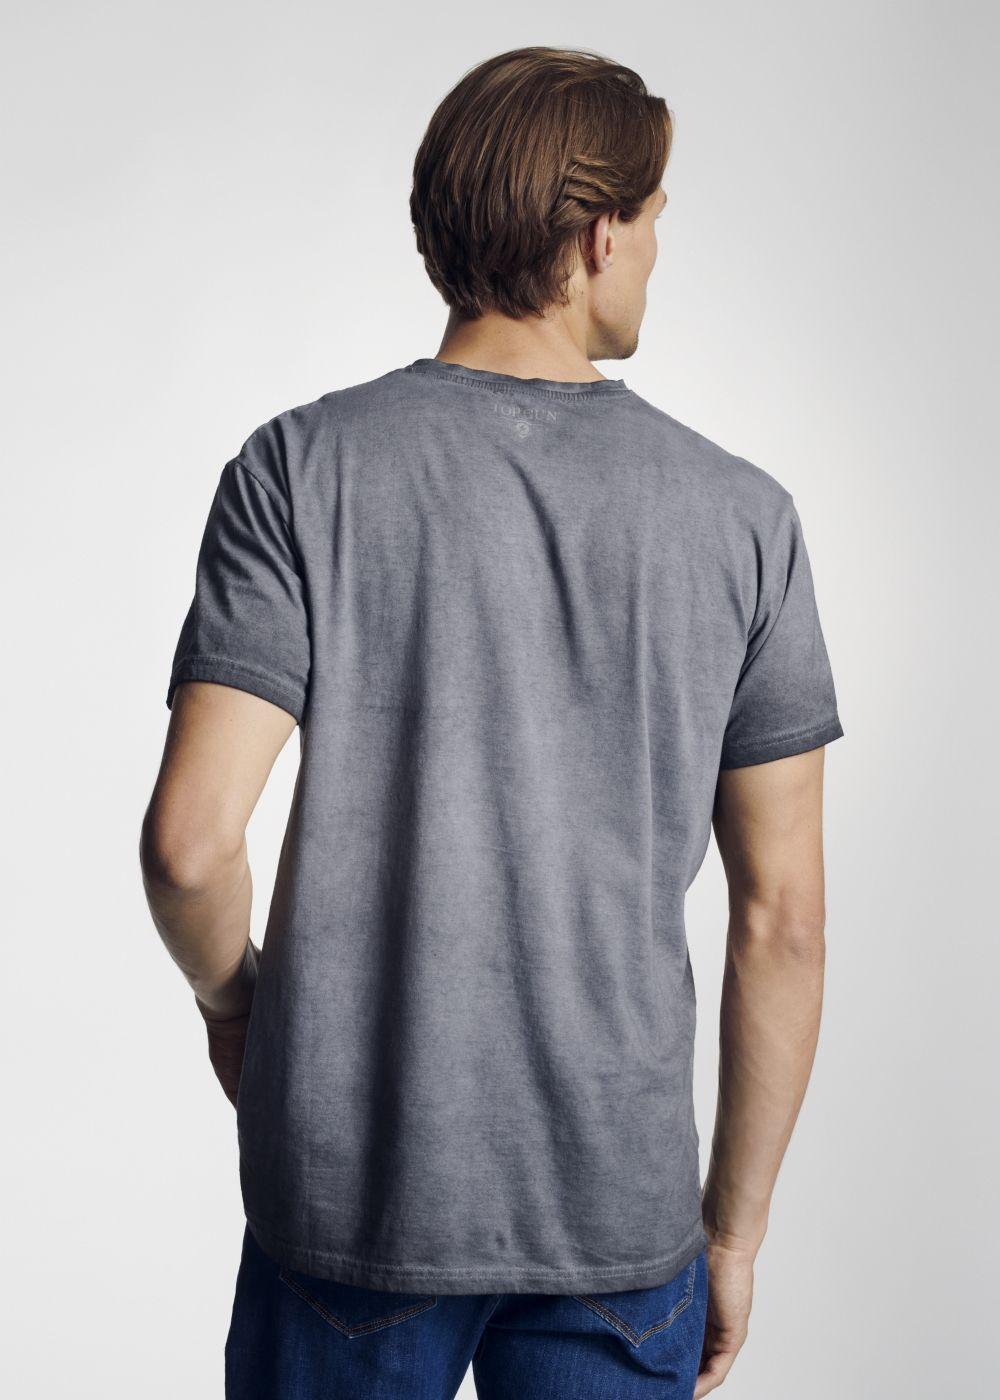 T-shirt męski TSHMT-0053-91(Z21)